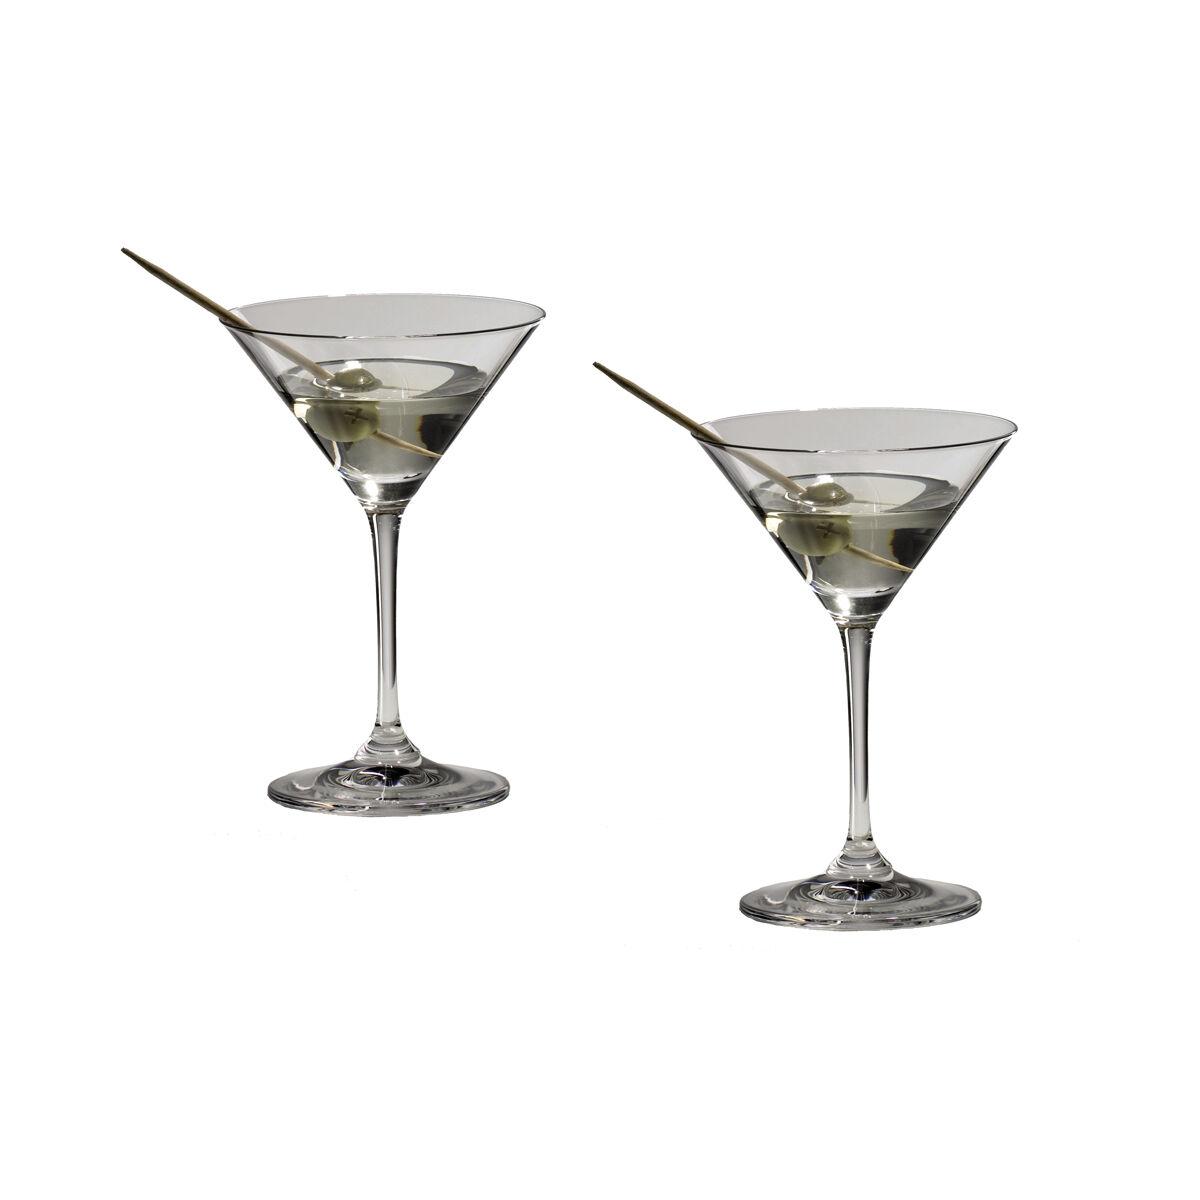 Riedel Vinum Martini Glasses - Set of 2